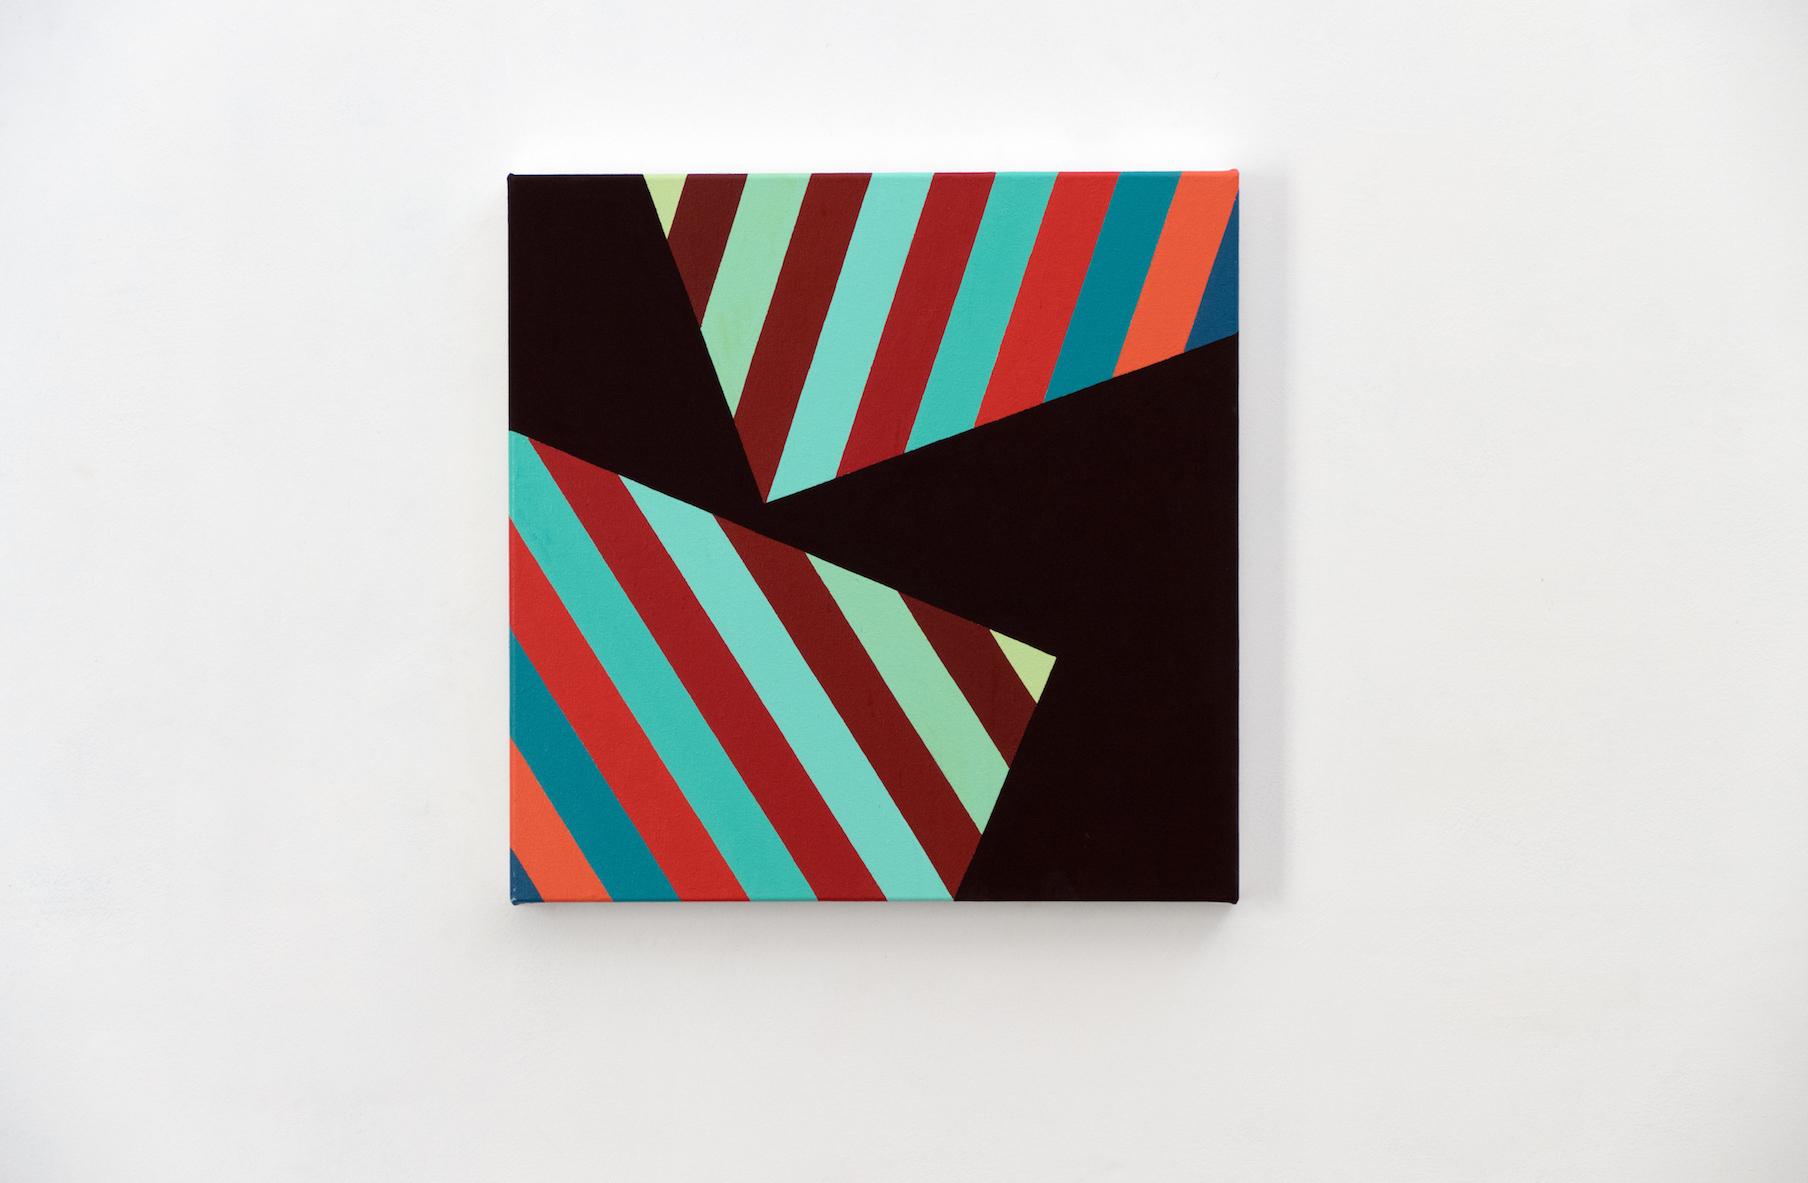 Tom Loveday Edge of Reality, Subordinate 7, 2018, Acrylic On Canvas 45 x 45 cm